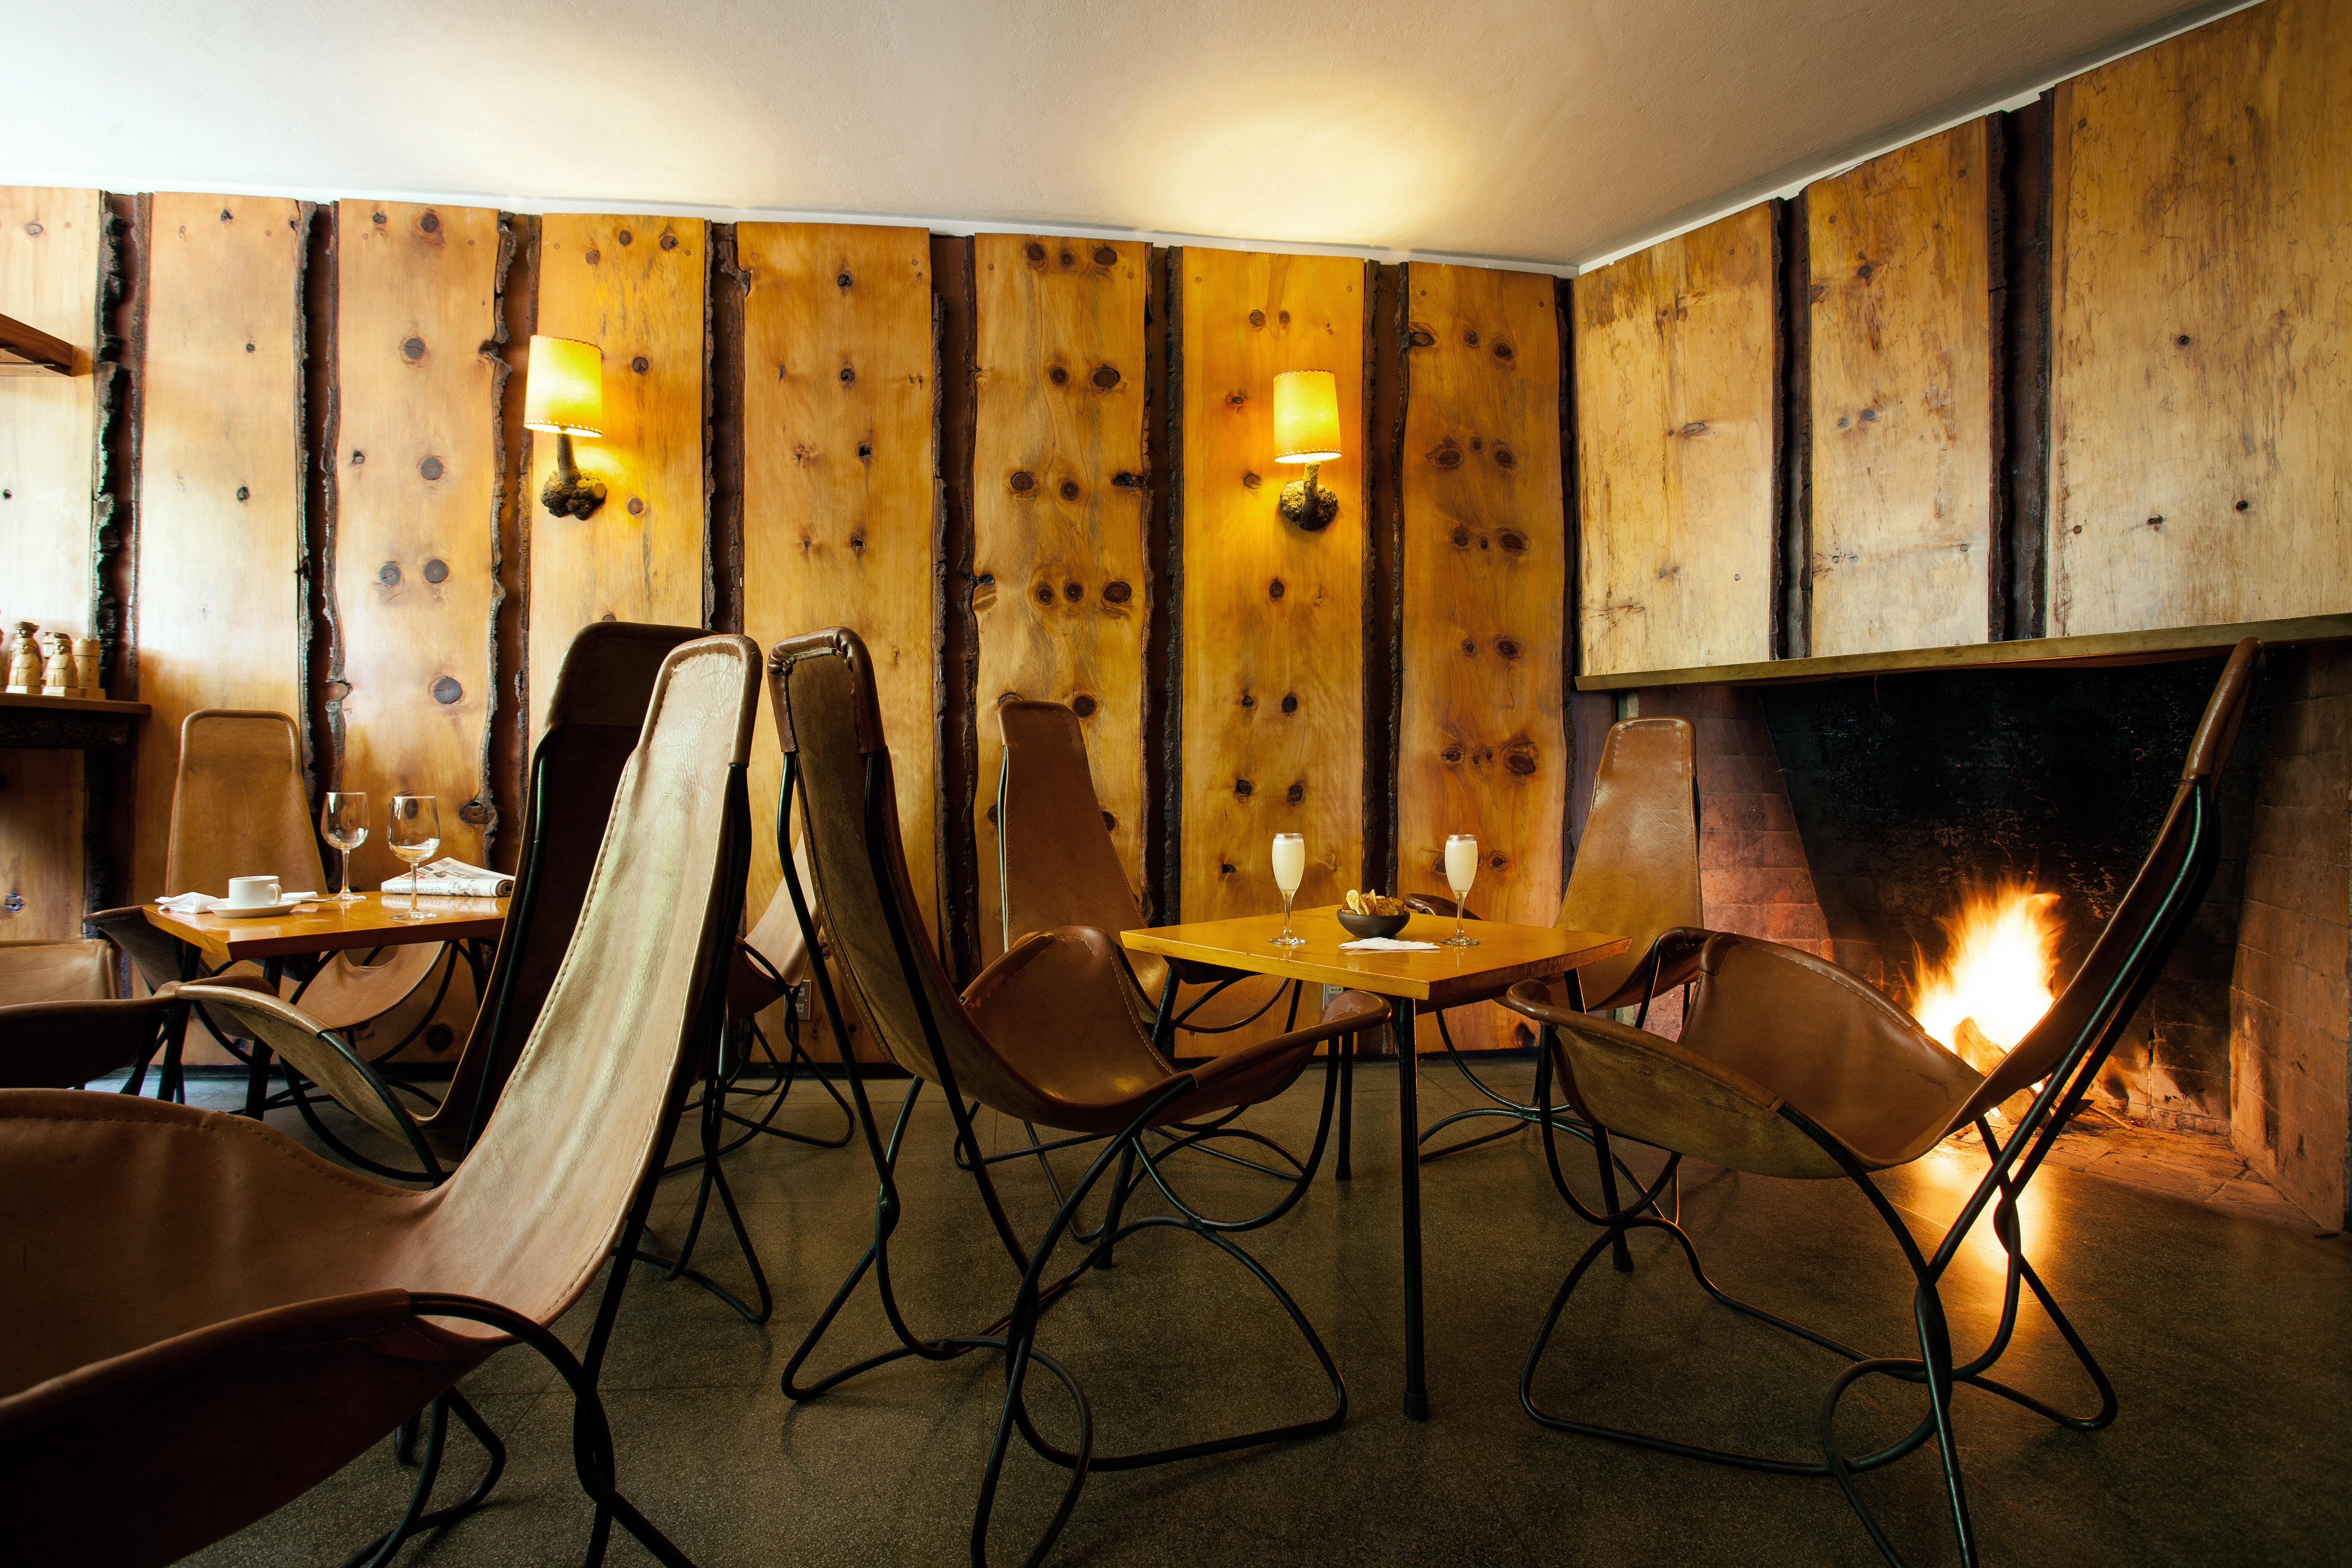 Dining Drink Eat Fireplace Luxury Modern Resort Scenic views light lighting restaurant